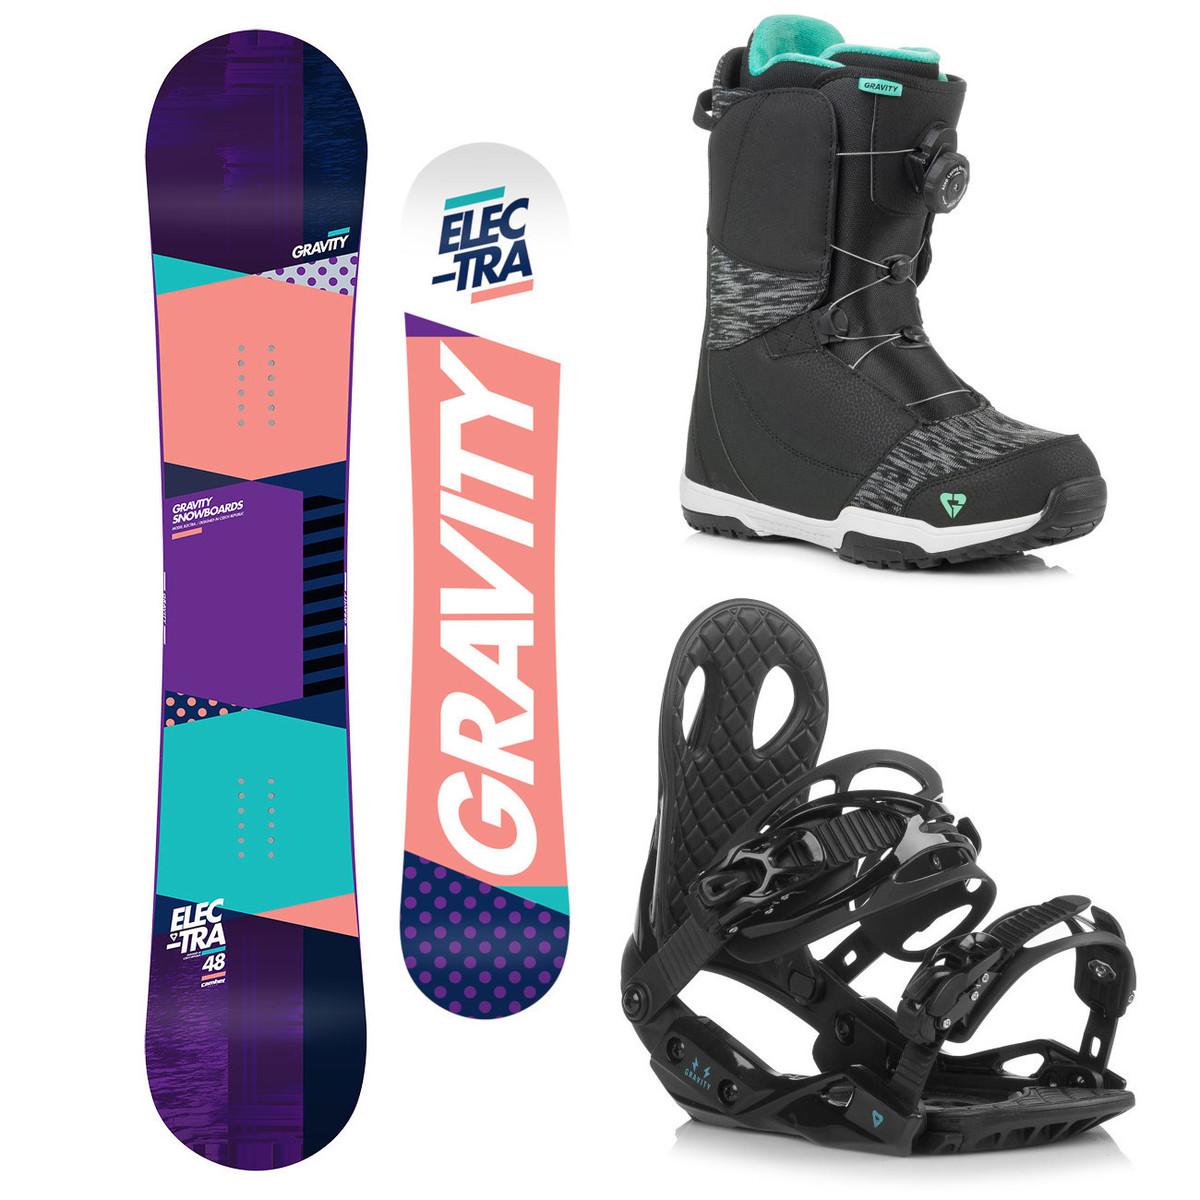 Snowboardový komplet Gravity Electra 18/19 M (EU 37-42) 151 Černá